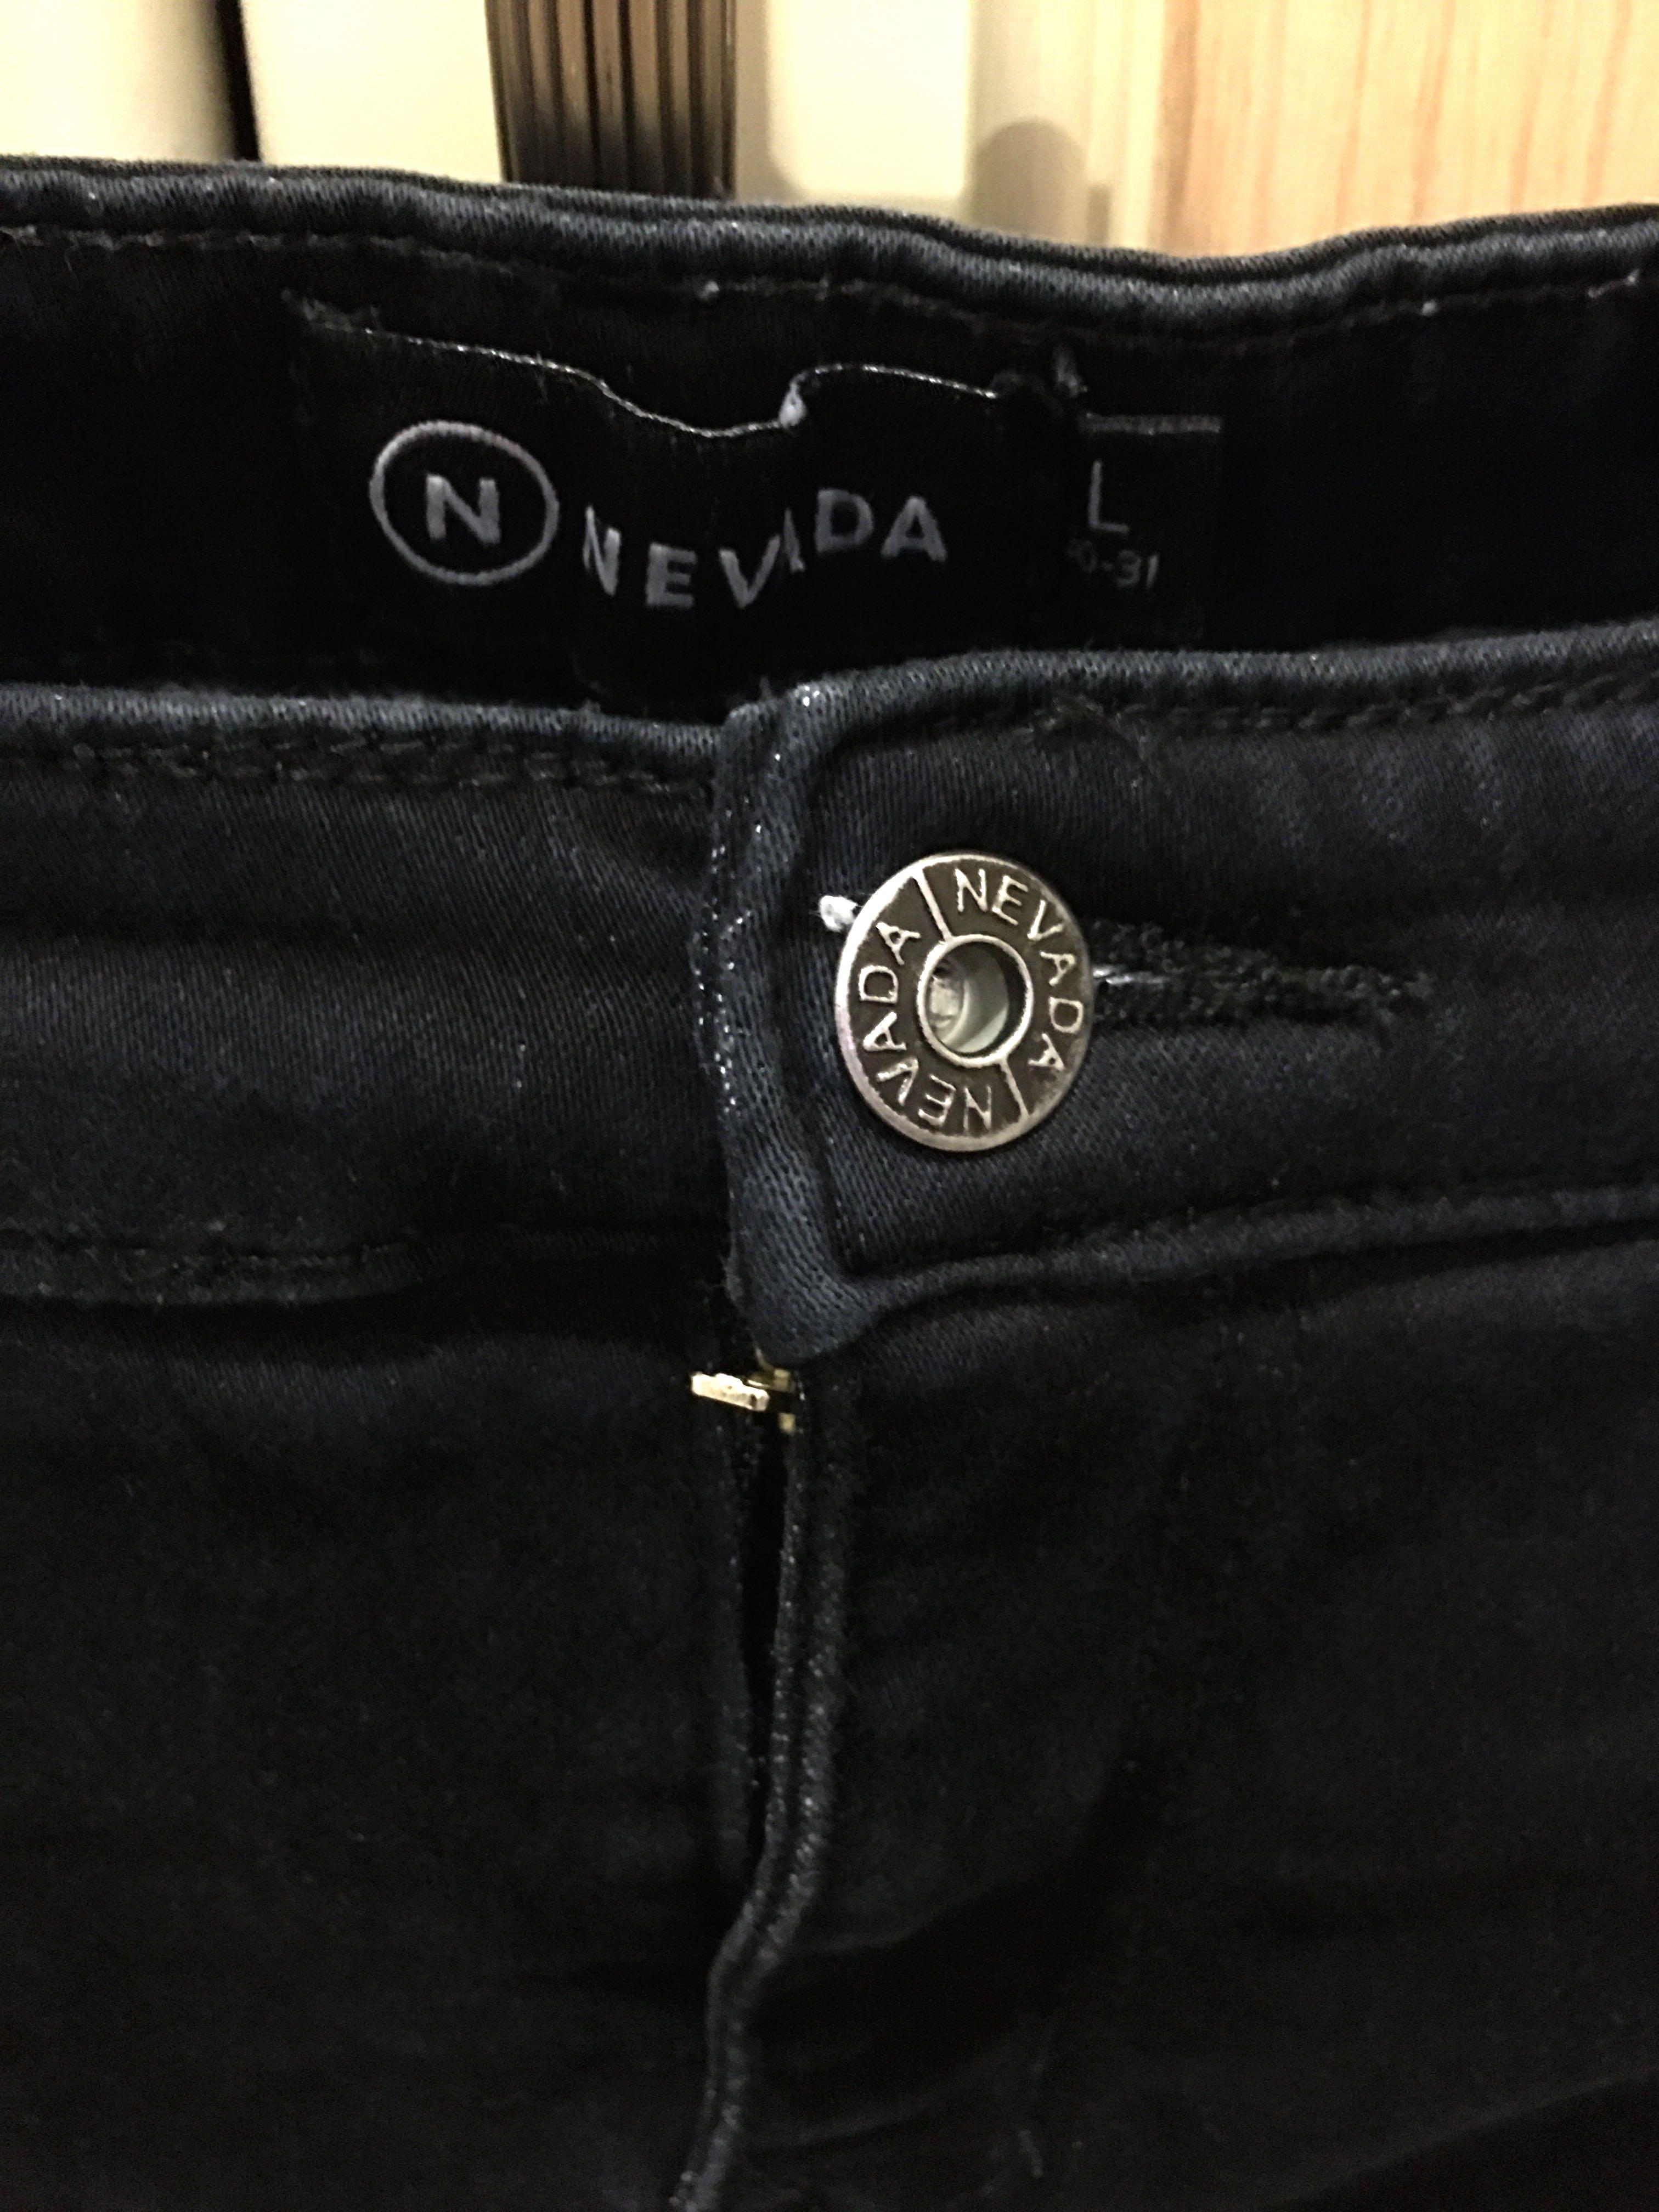 Nevada Black Denim